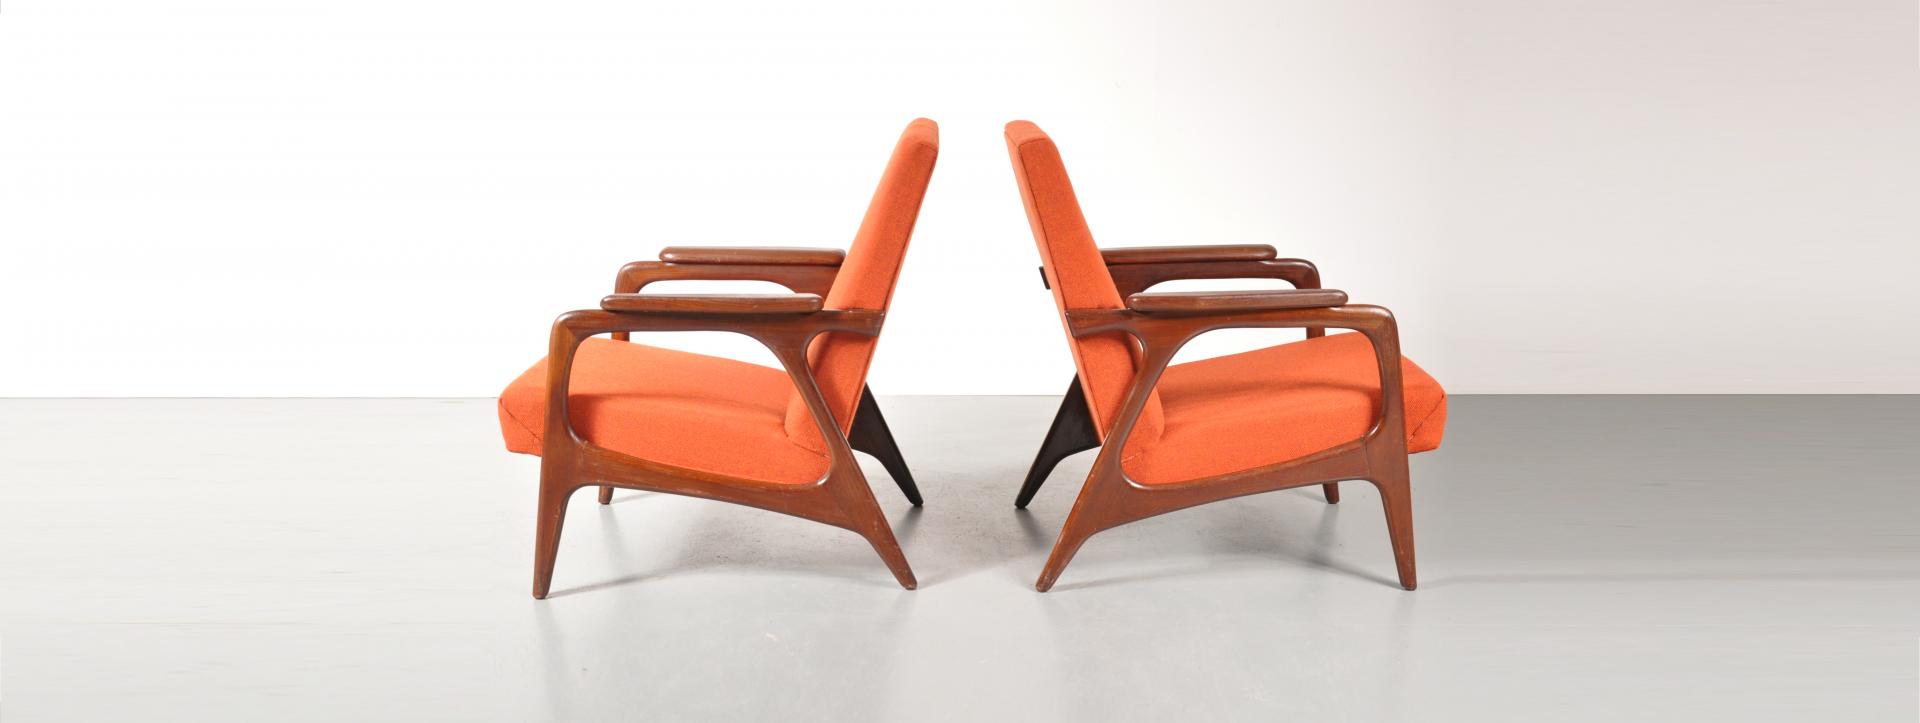 Plastic Design Stoelen.1950s Pair Of Dutch Design Lounge Chairs Designed By Louis Van